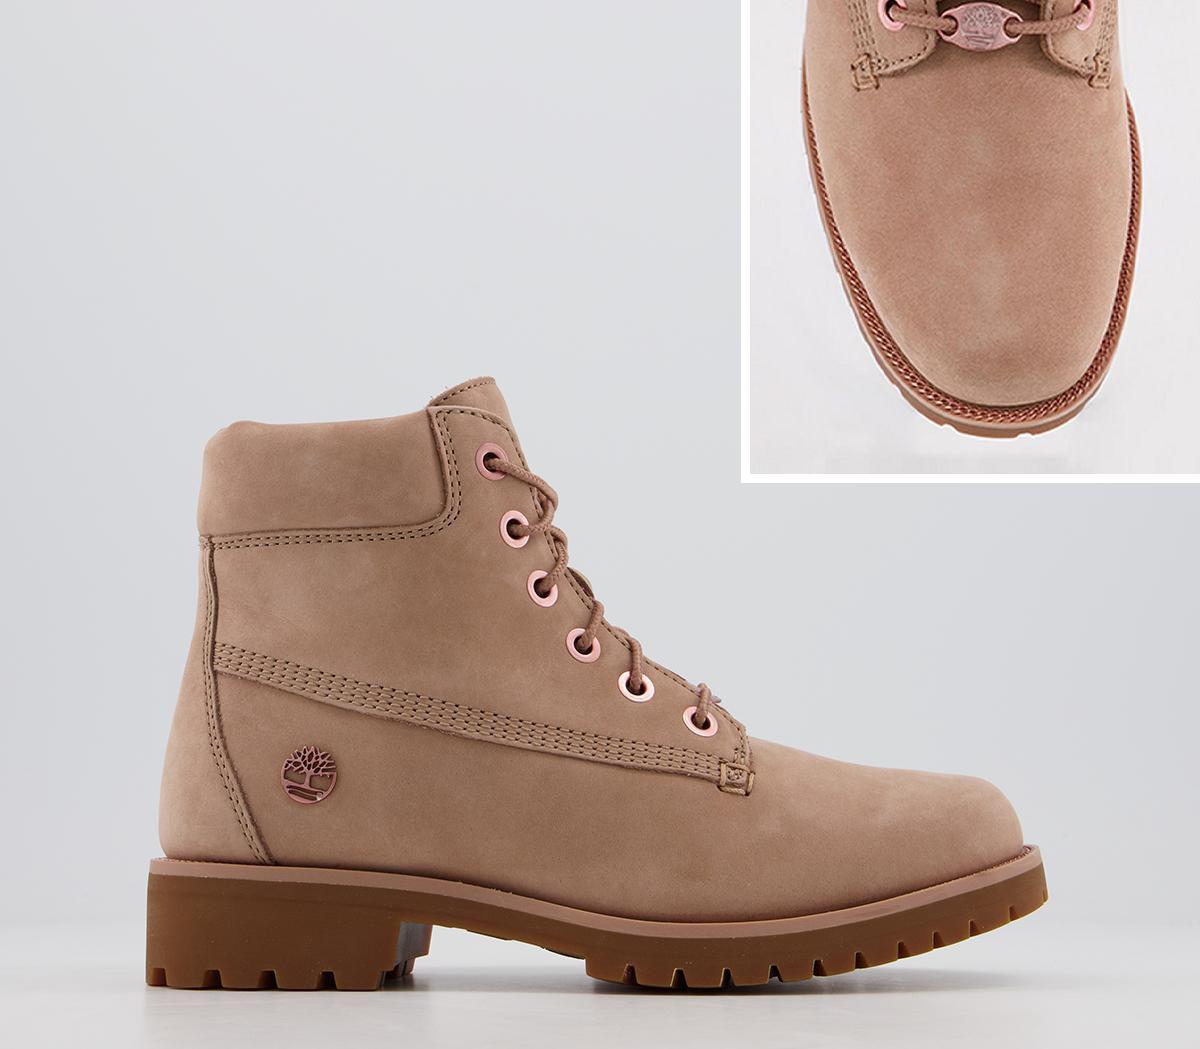 lanzar póngase en fila La cabra Billy  Womens Timberland Slim Premium 6 Inch Boots Tawny Rose Gold Chain Boots |  eBay